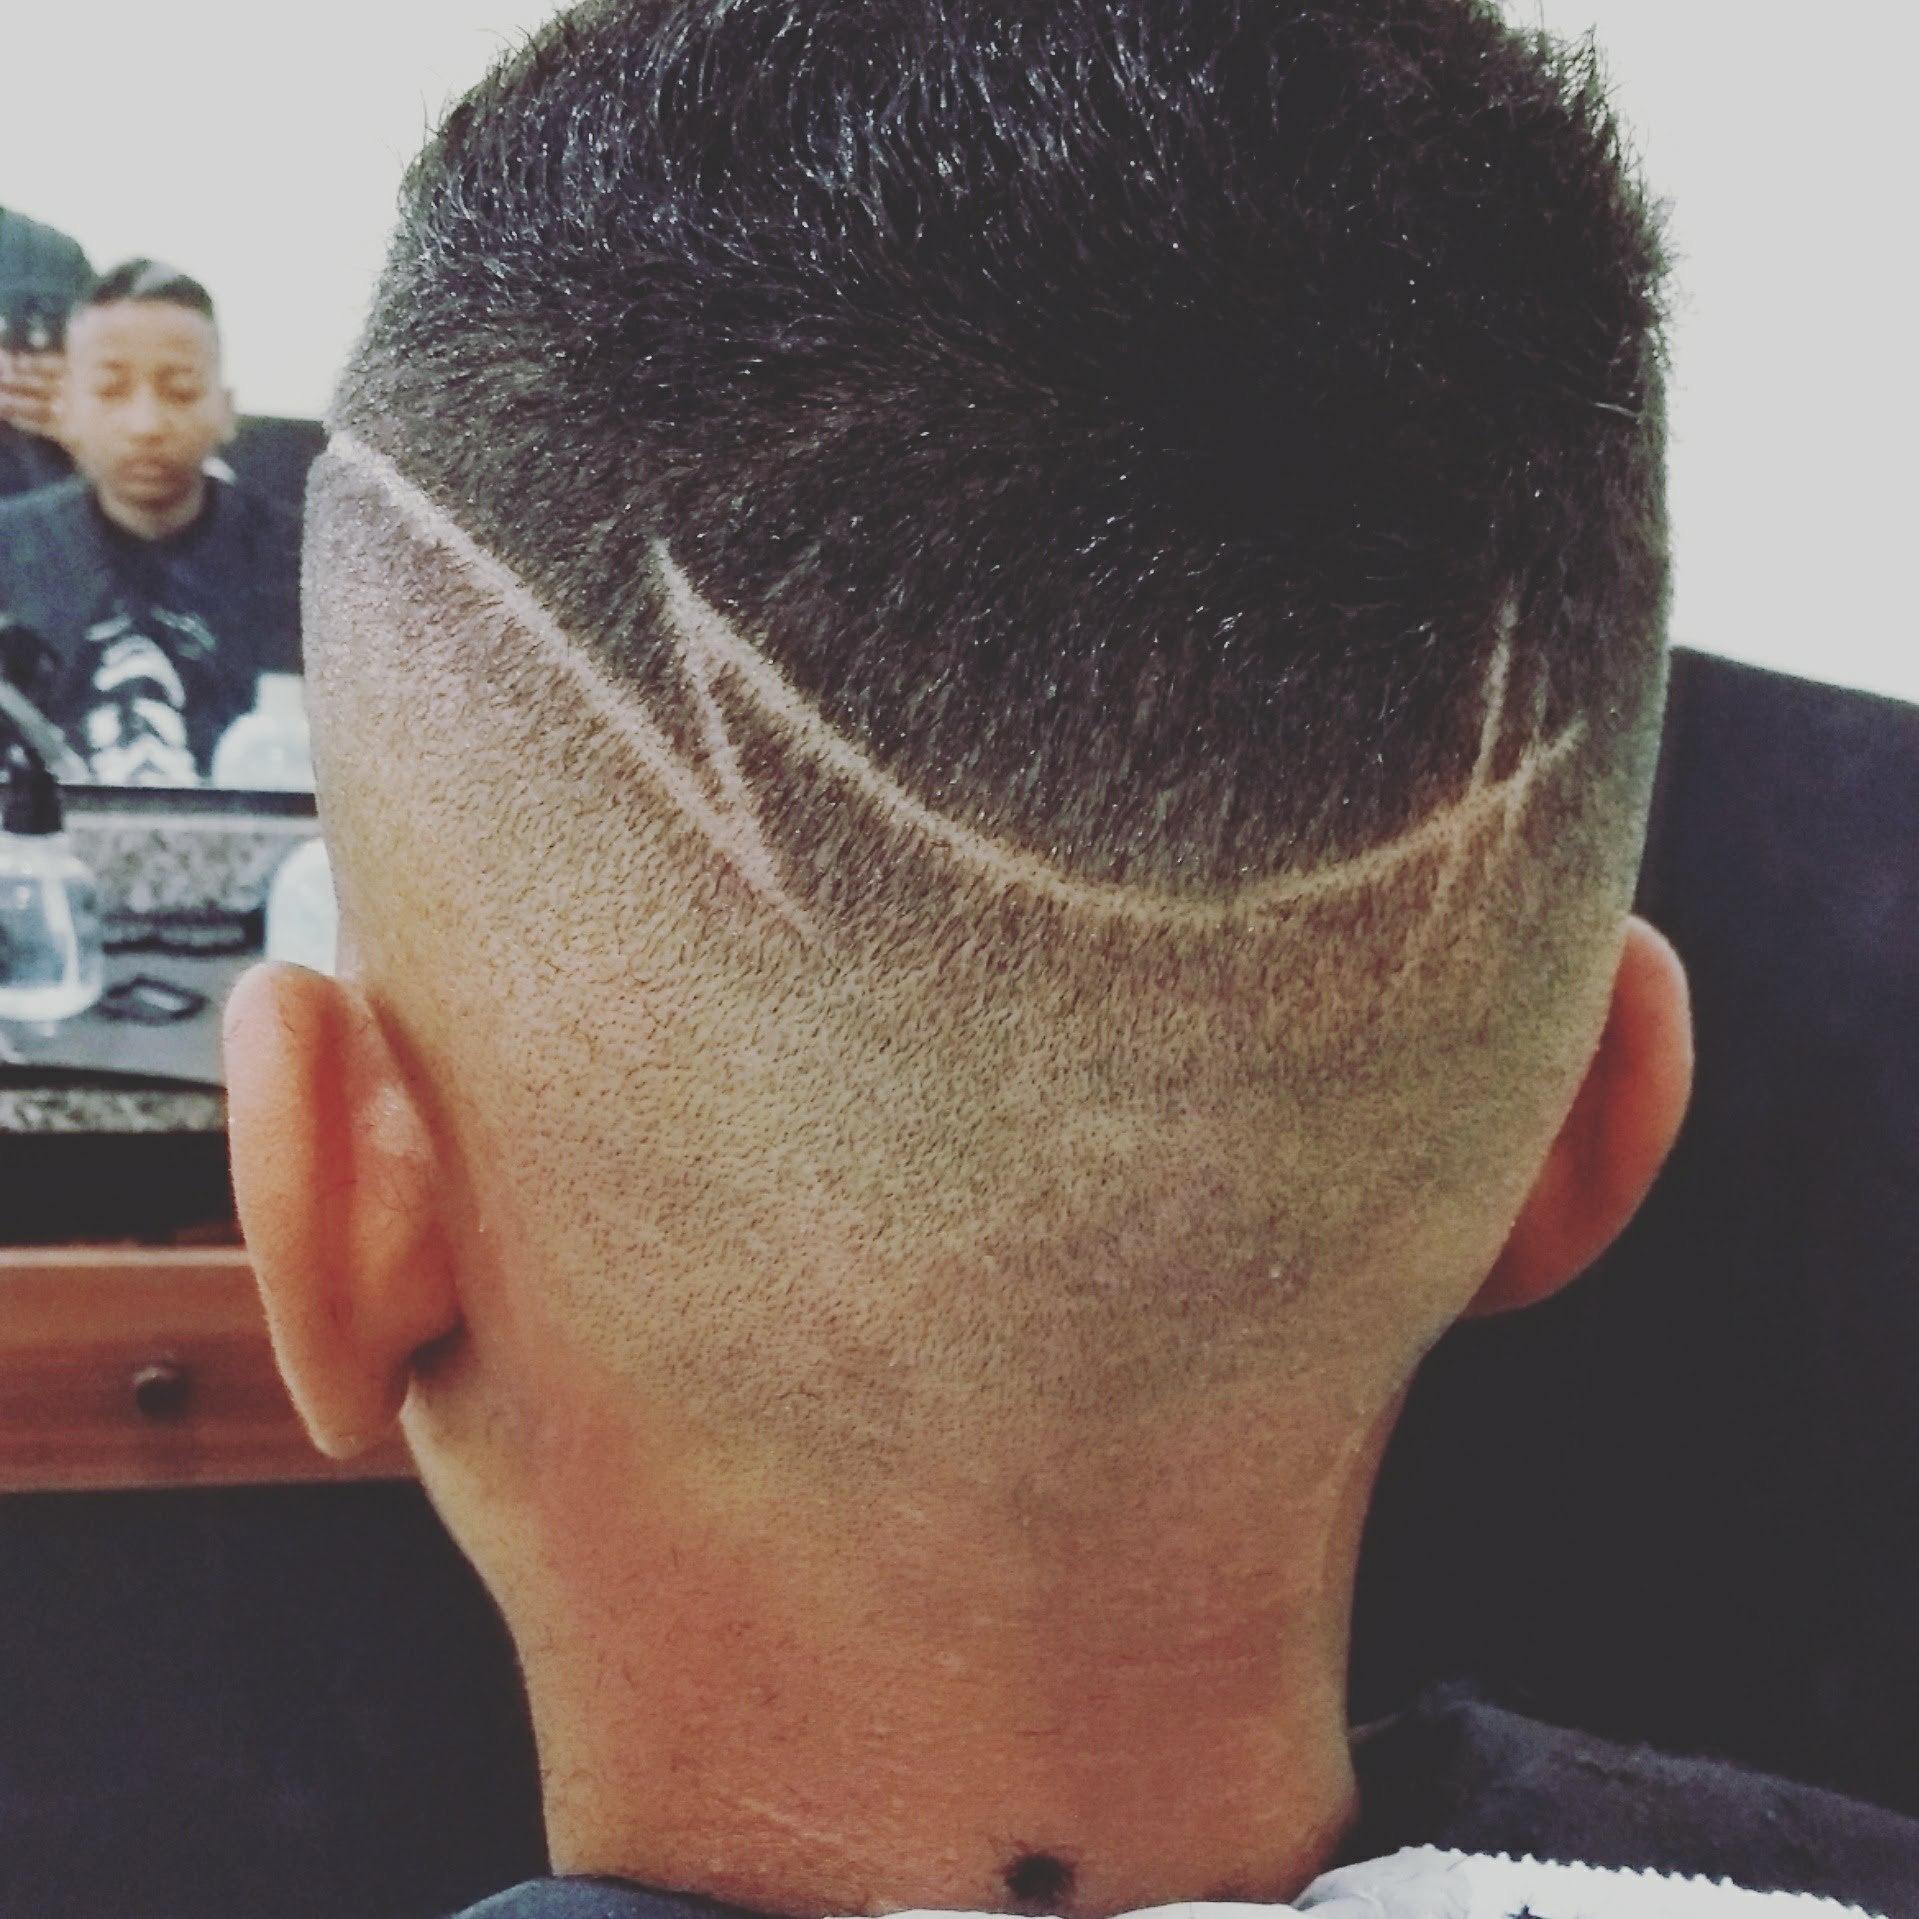 #barbershop #degrade #barberstyle #barberlove cabelo barbeiro(a)